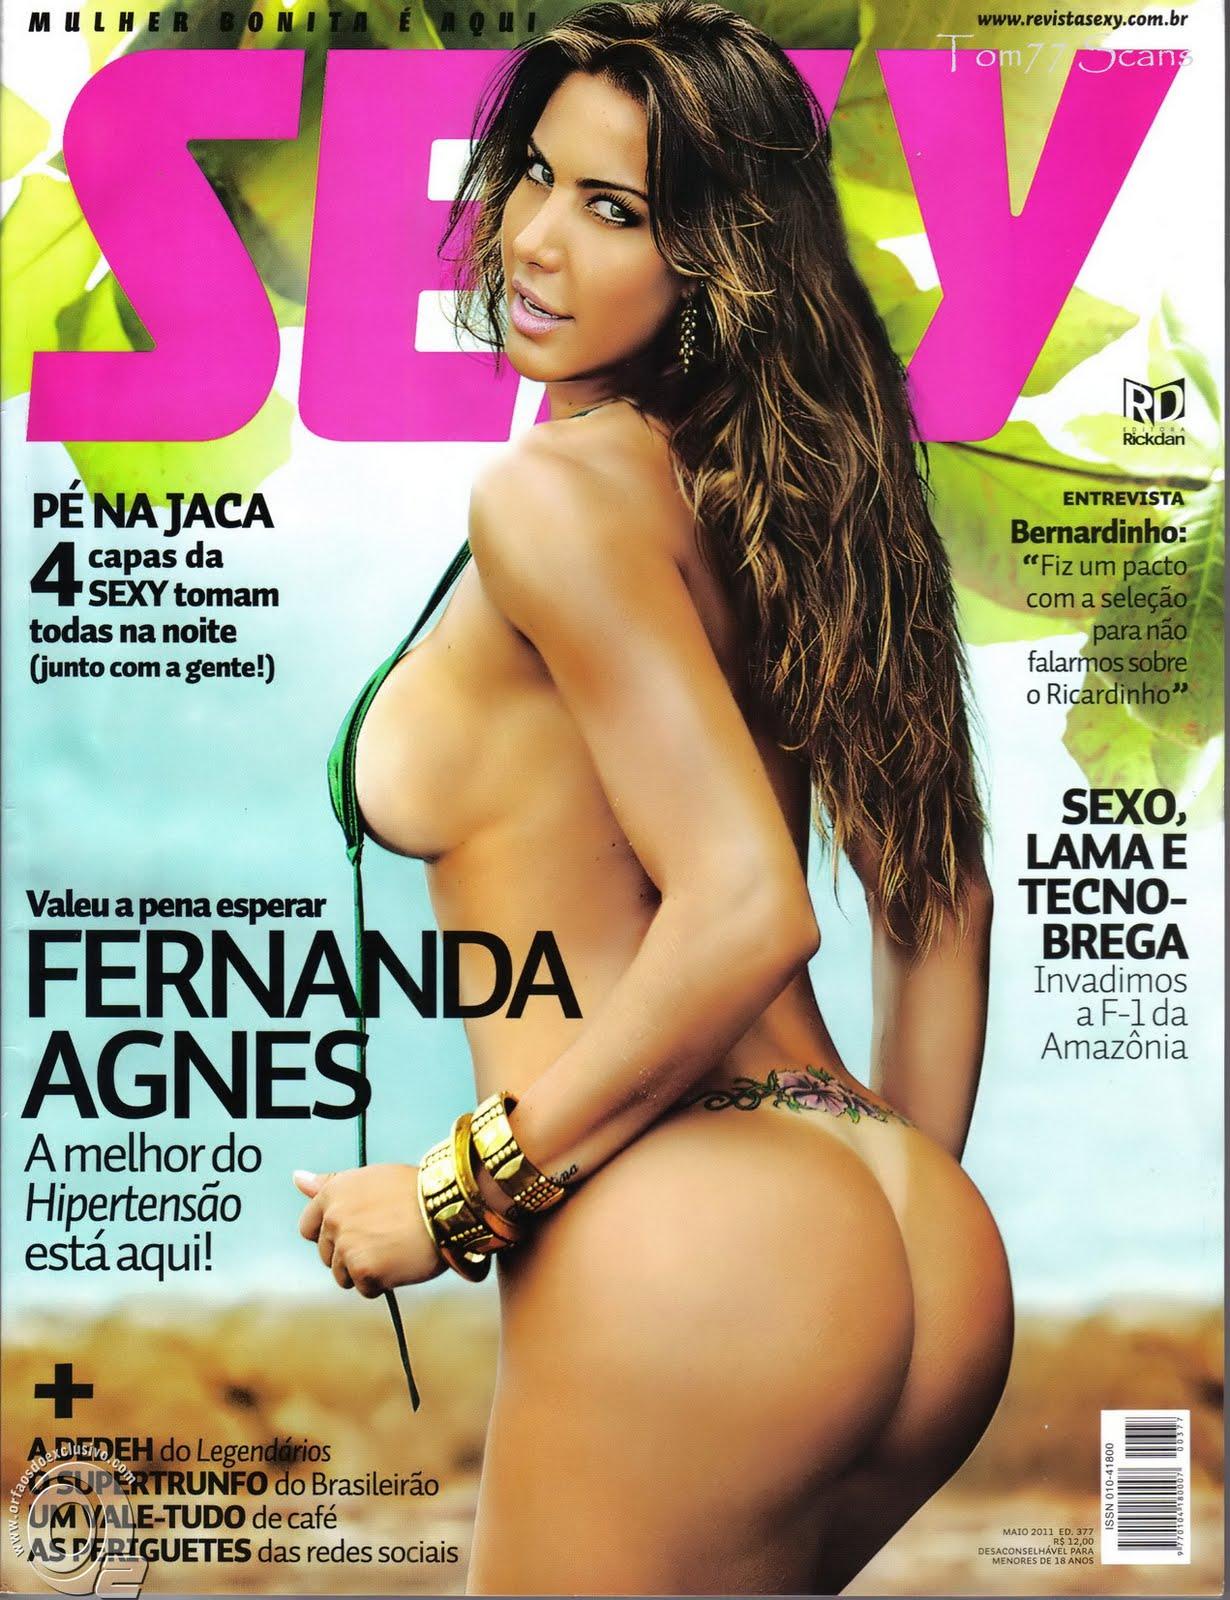 fernanda agnes desnuda sexy mayo 2011 brasil